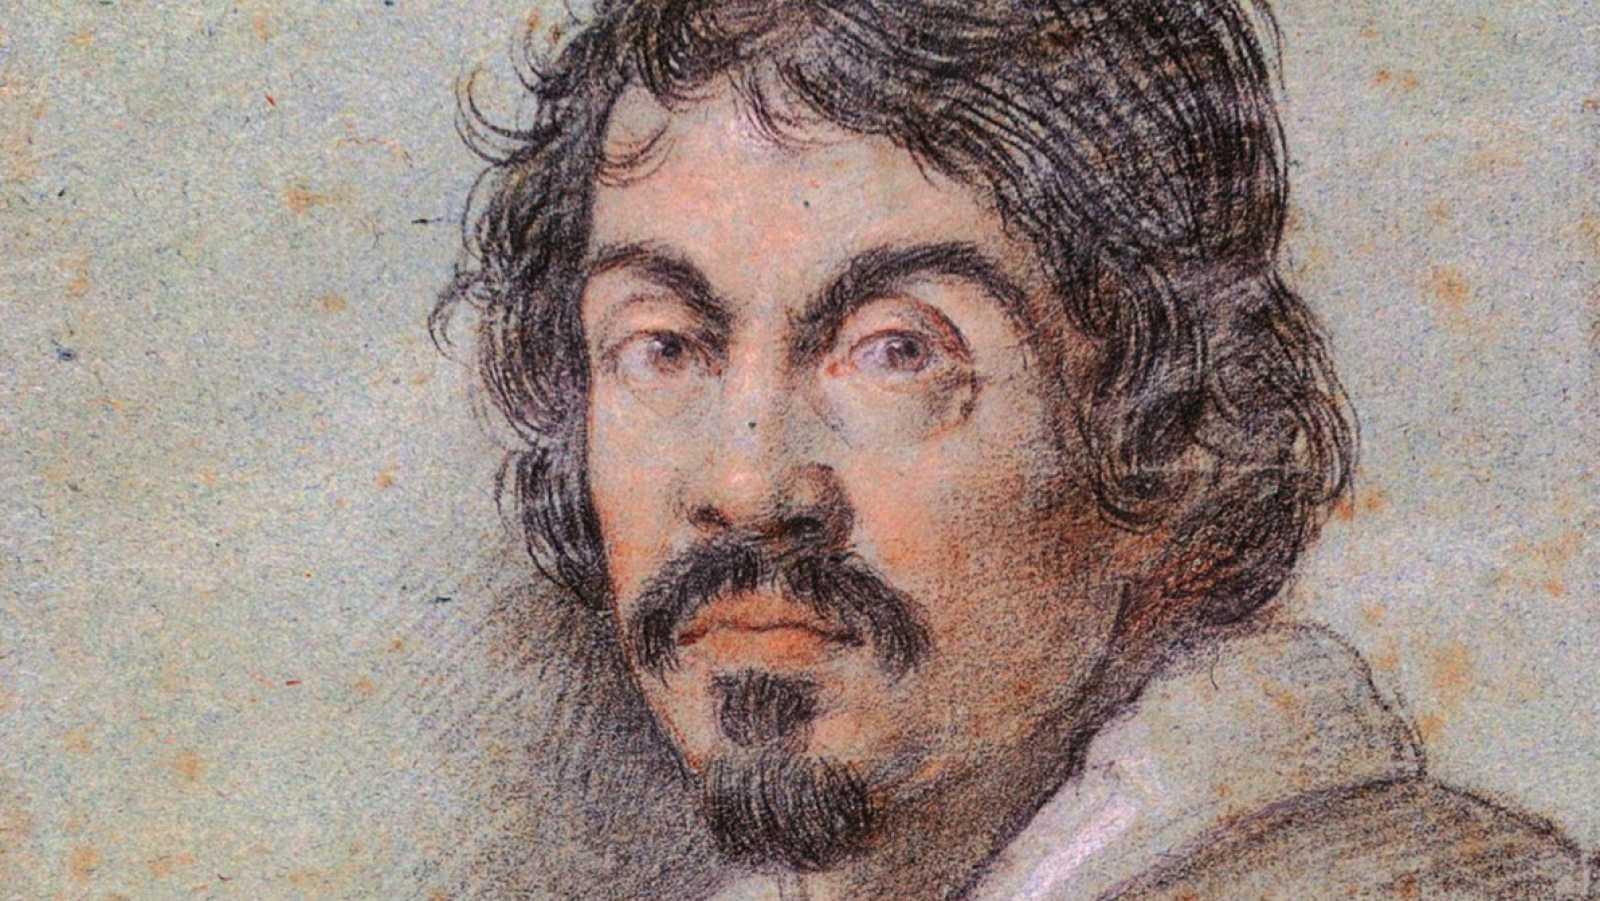 Música antigua - Caravaggio - 01/06/12 - Escuchar ahora